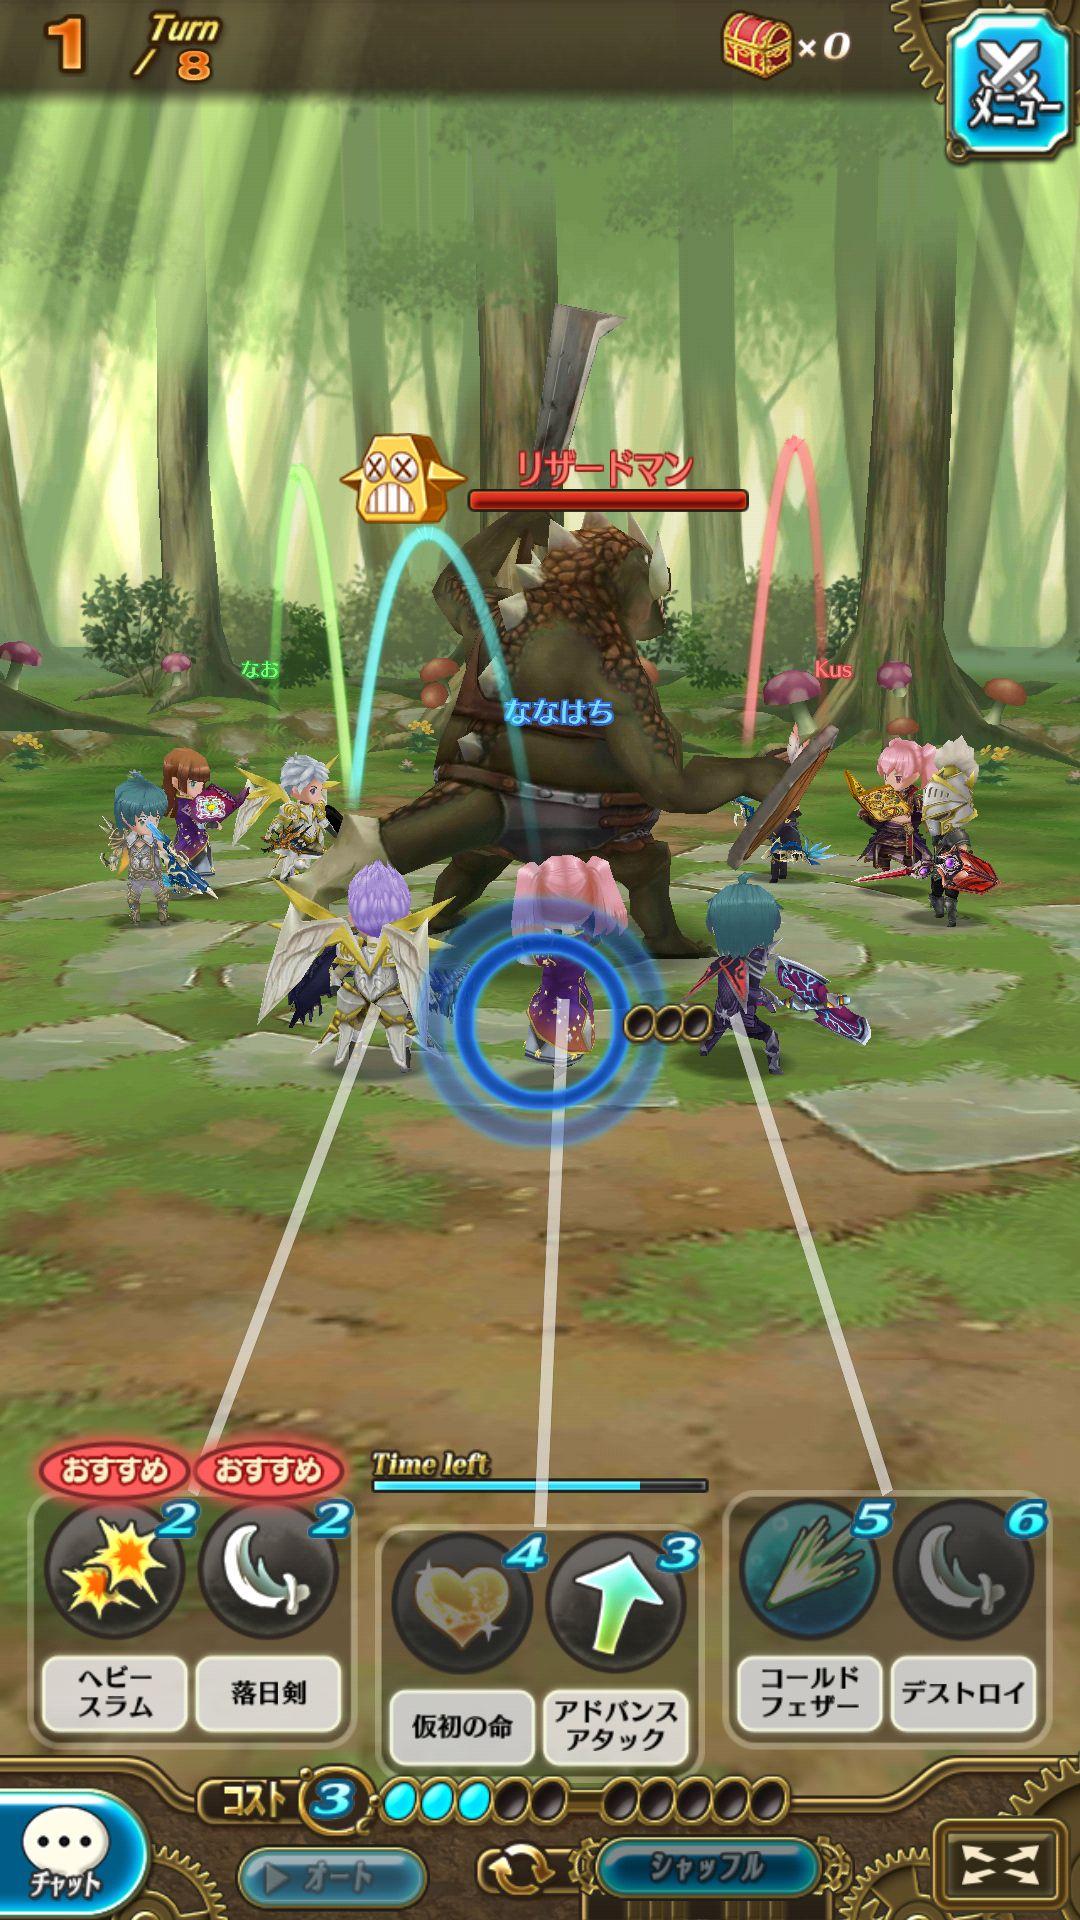 androidアプリ トライリンク 光の女神と七魔獣攻略スクリーンショット4